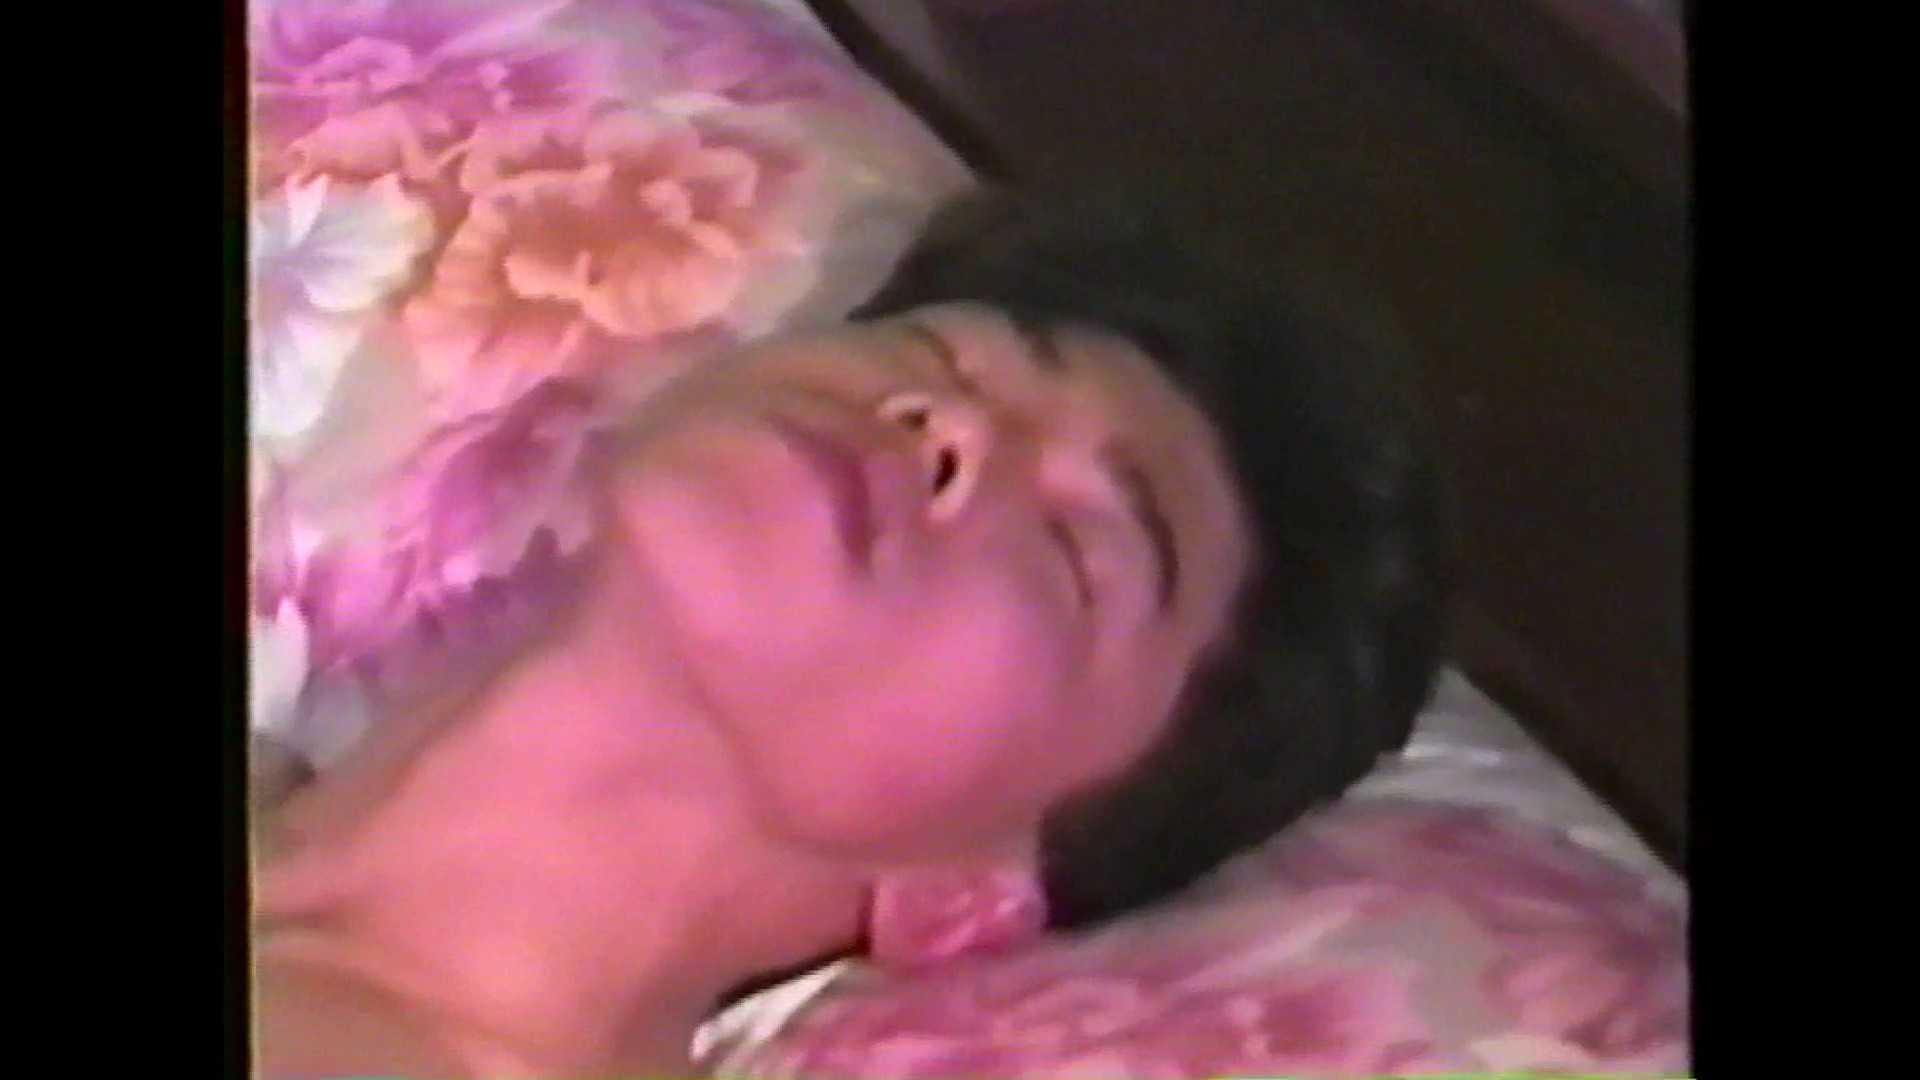 GAYBOY宏のオカズ倉庫Vol.2-1 完全無修正 | いやらしいノンケ  11枚 9